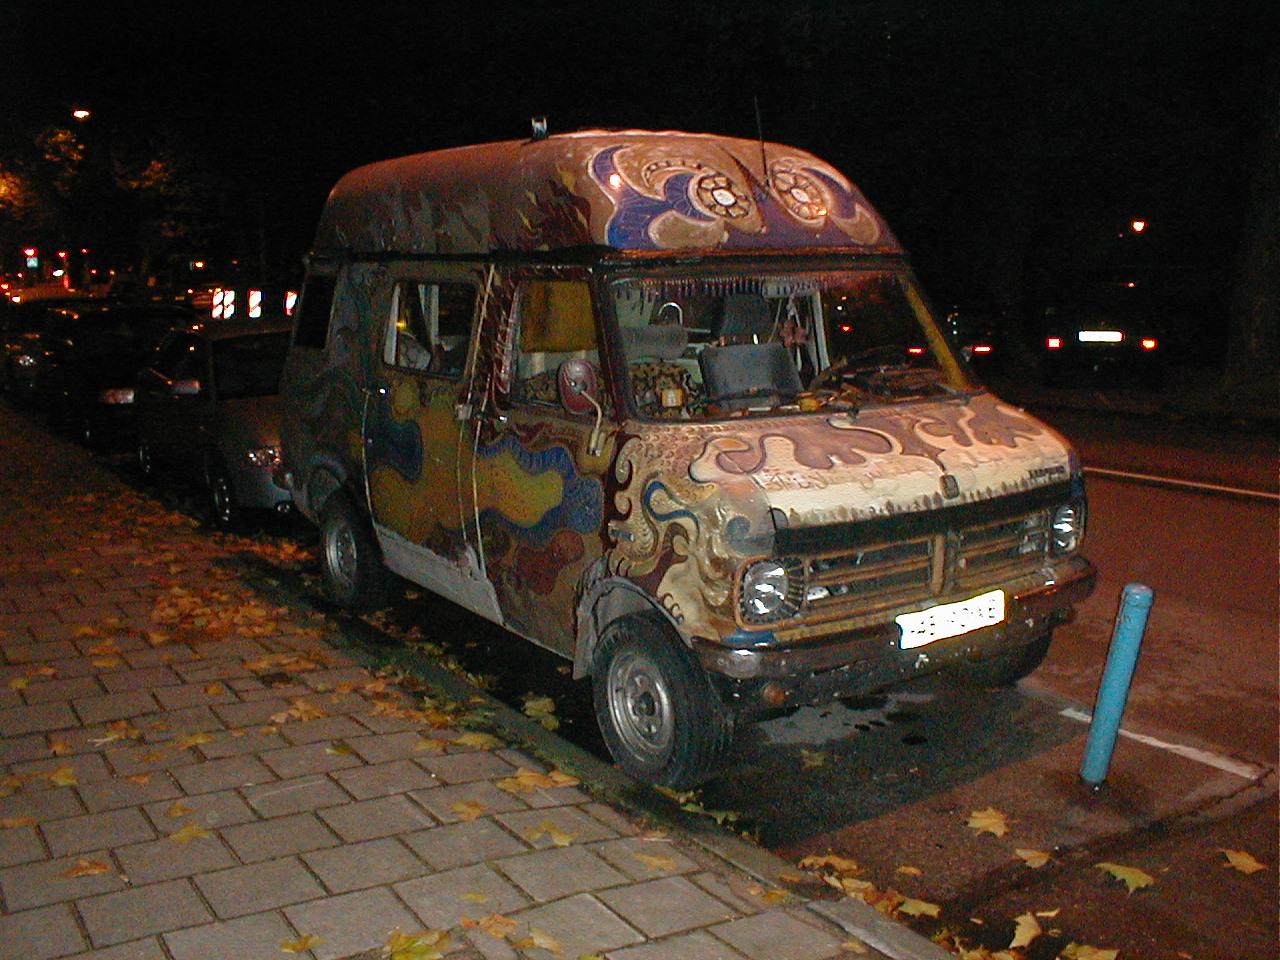 dario car painy painted hippie mobile van